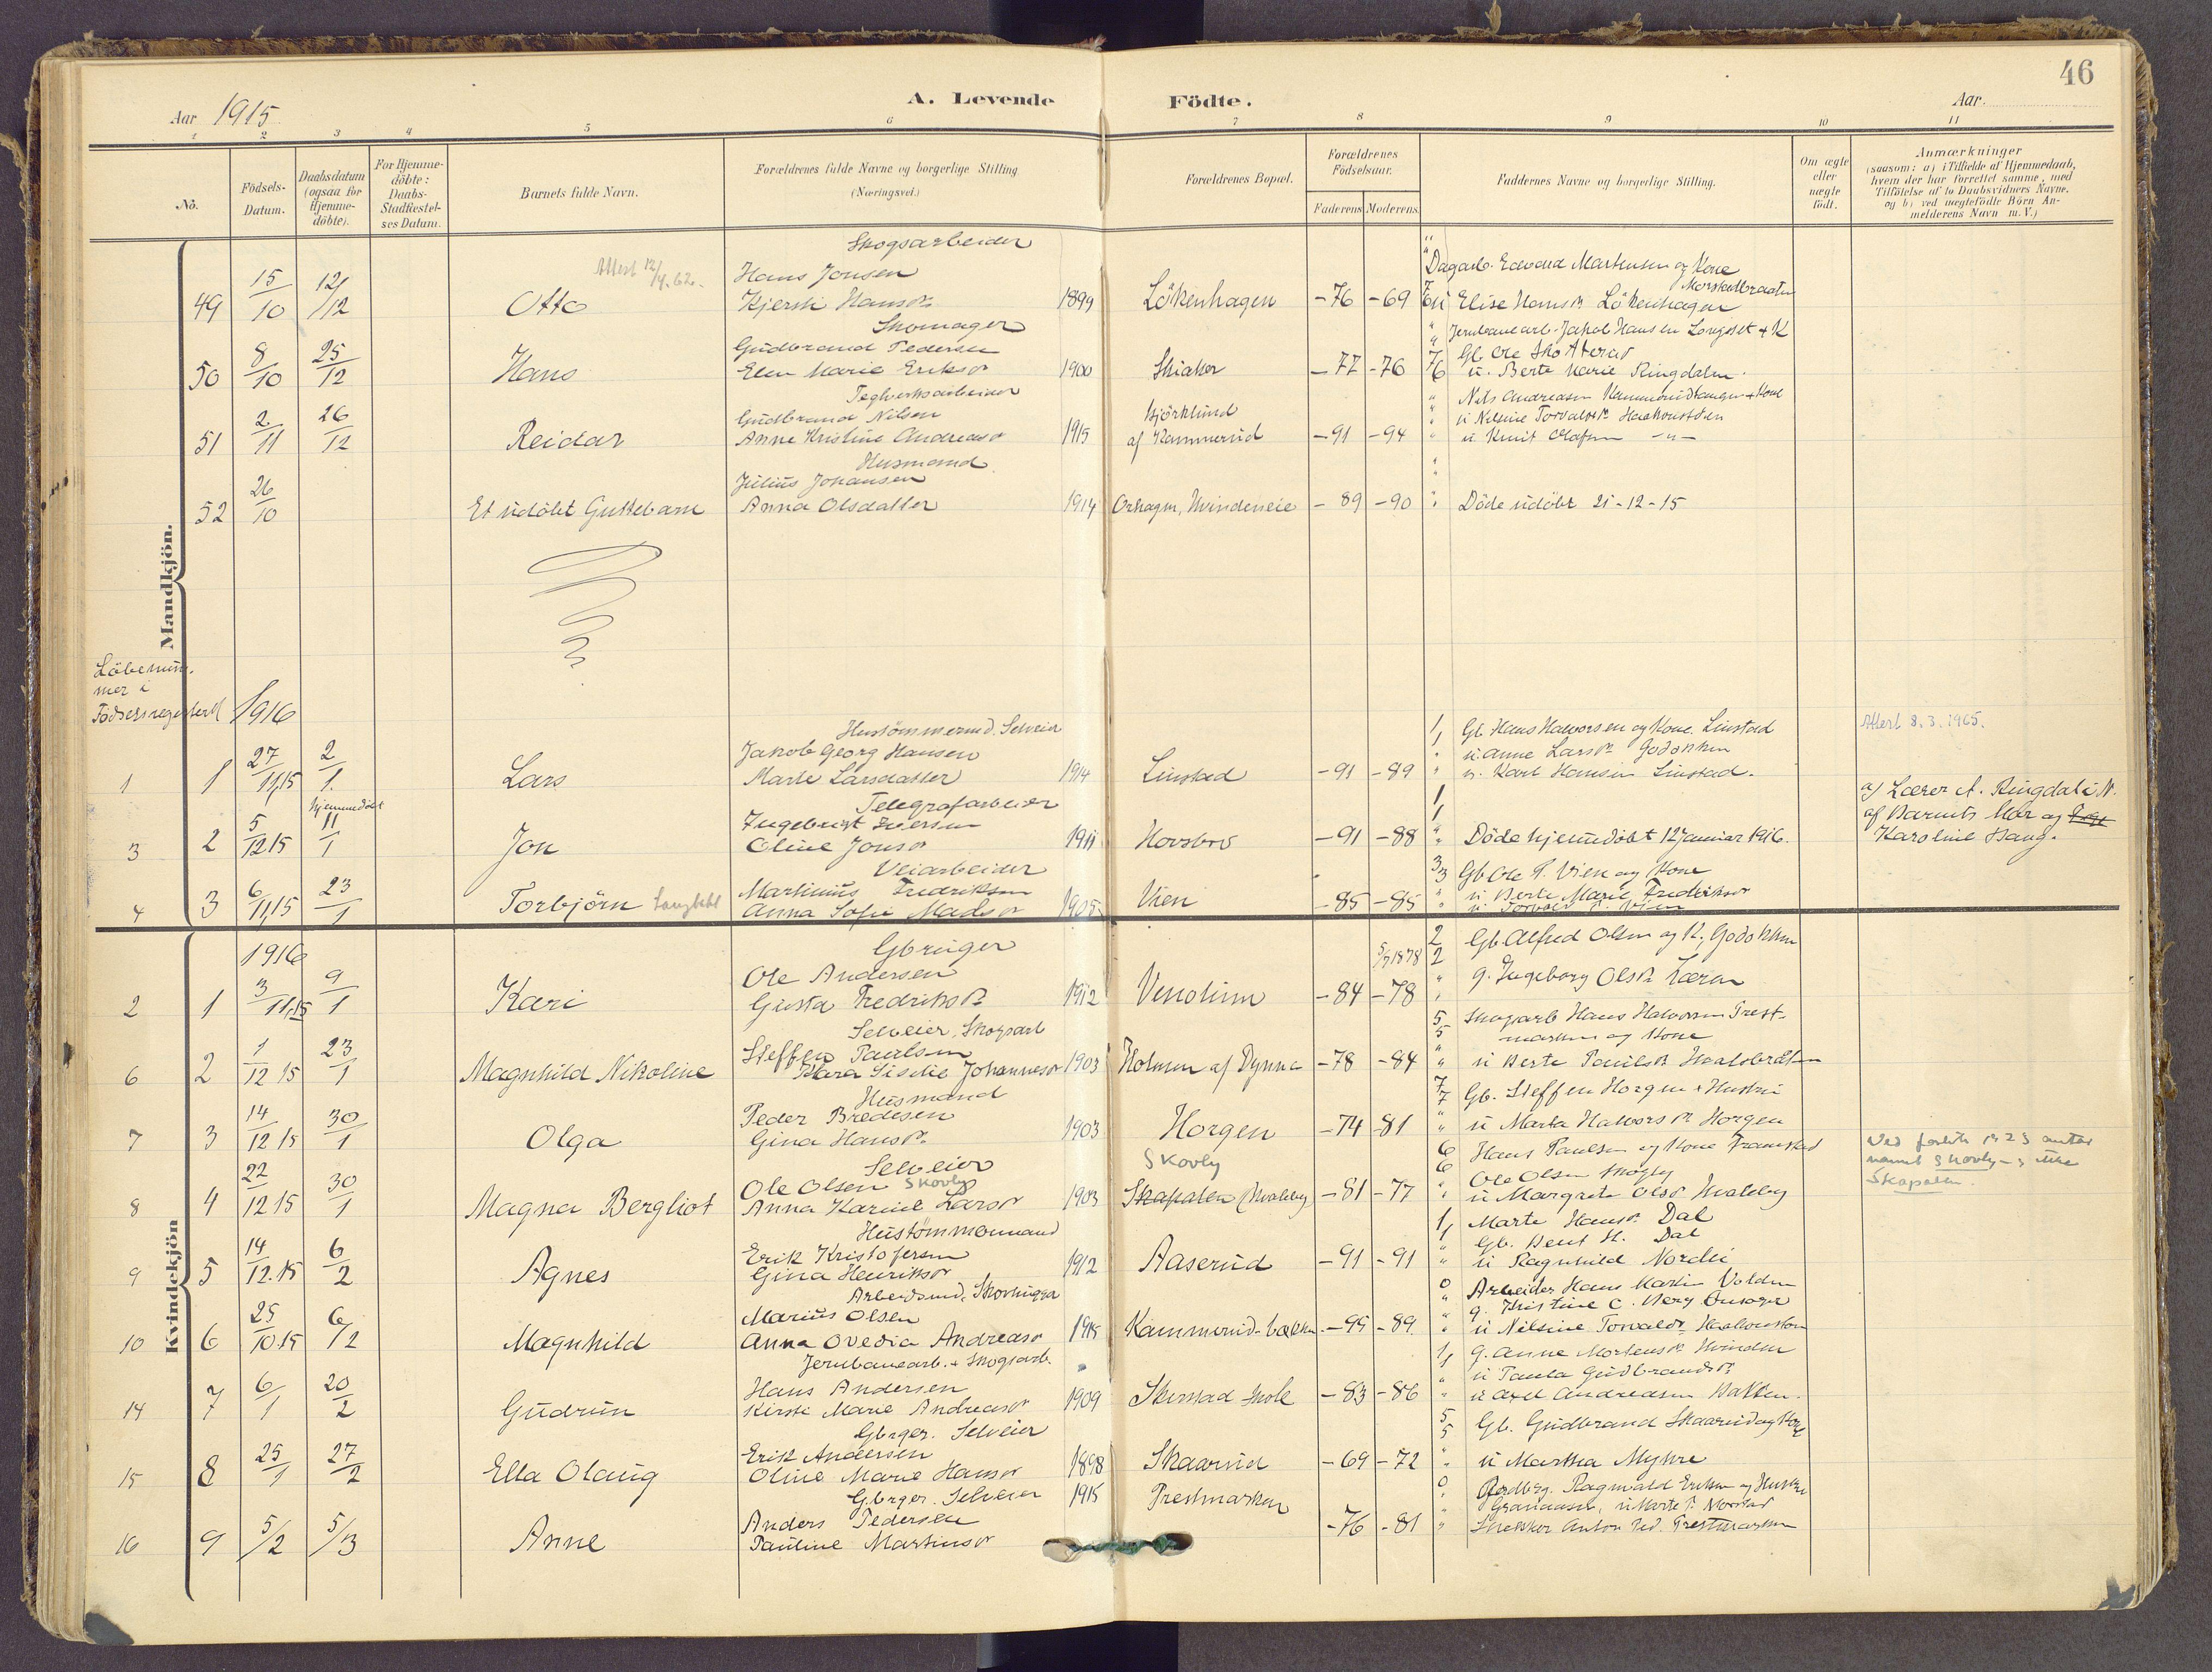 SAH, Gran prestekontor, Ministerialbok nr. 21, 1908-1932, s. 46